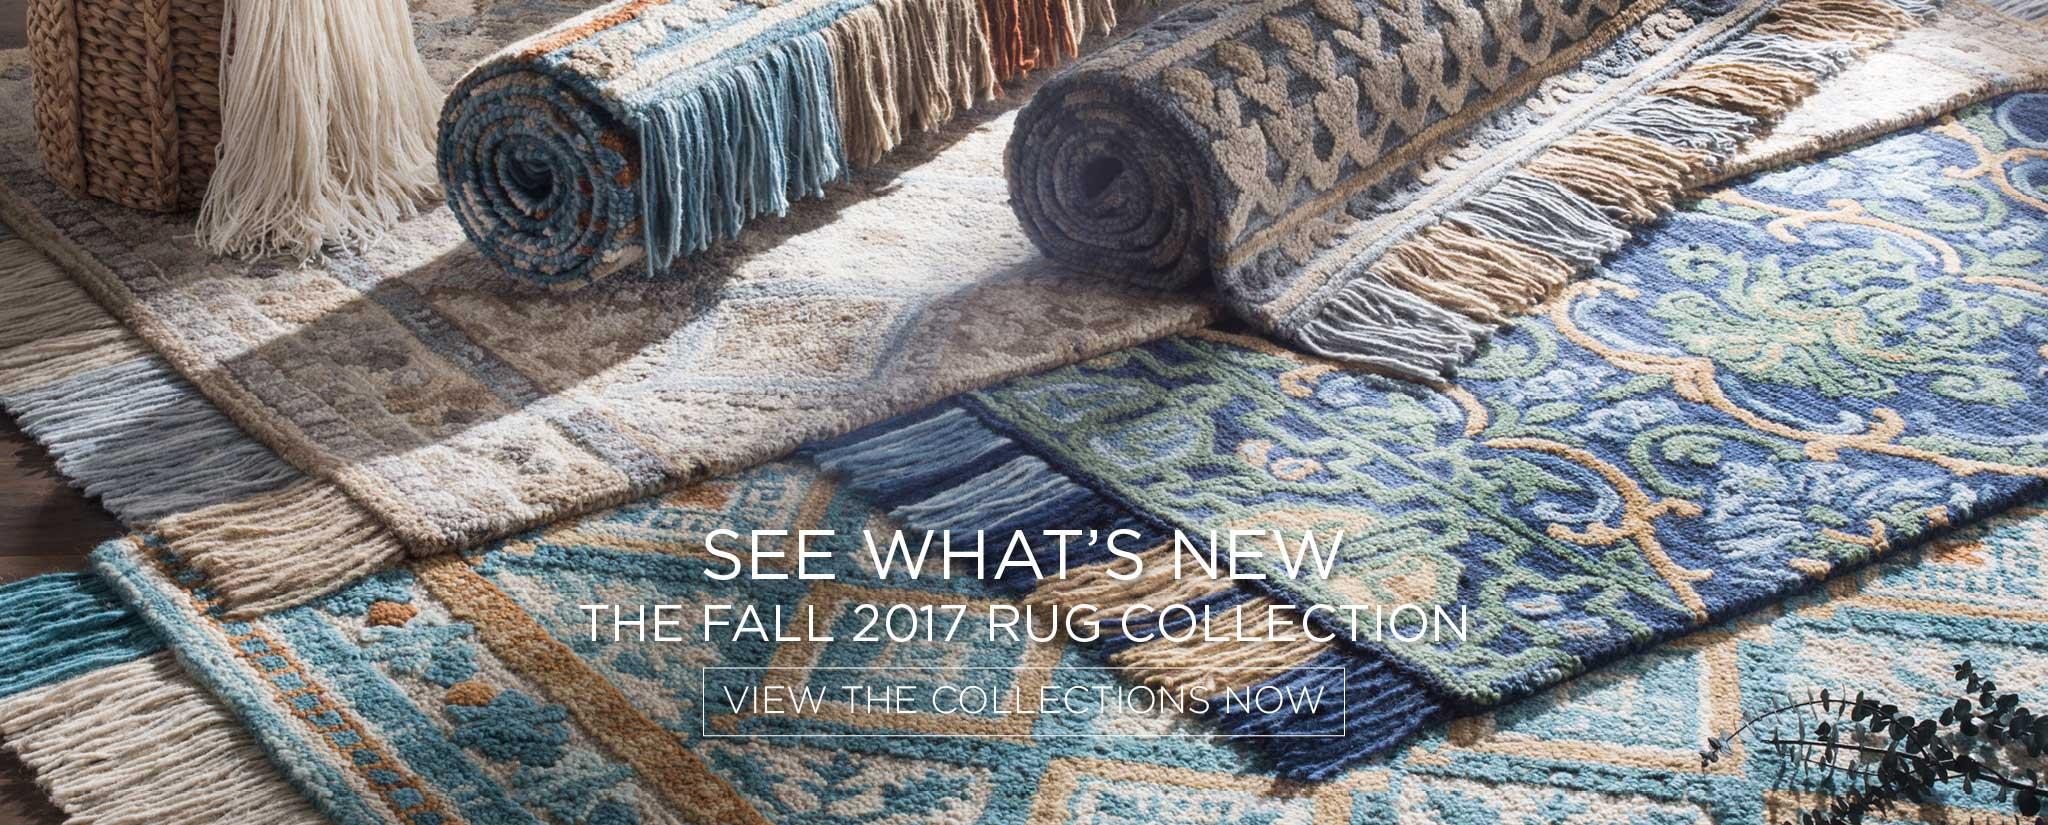 rugs home furnishings safavieh com luxurious area rugs fine home furnishings for beautiful homes like yours